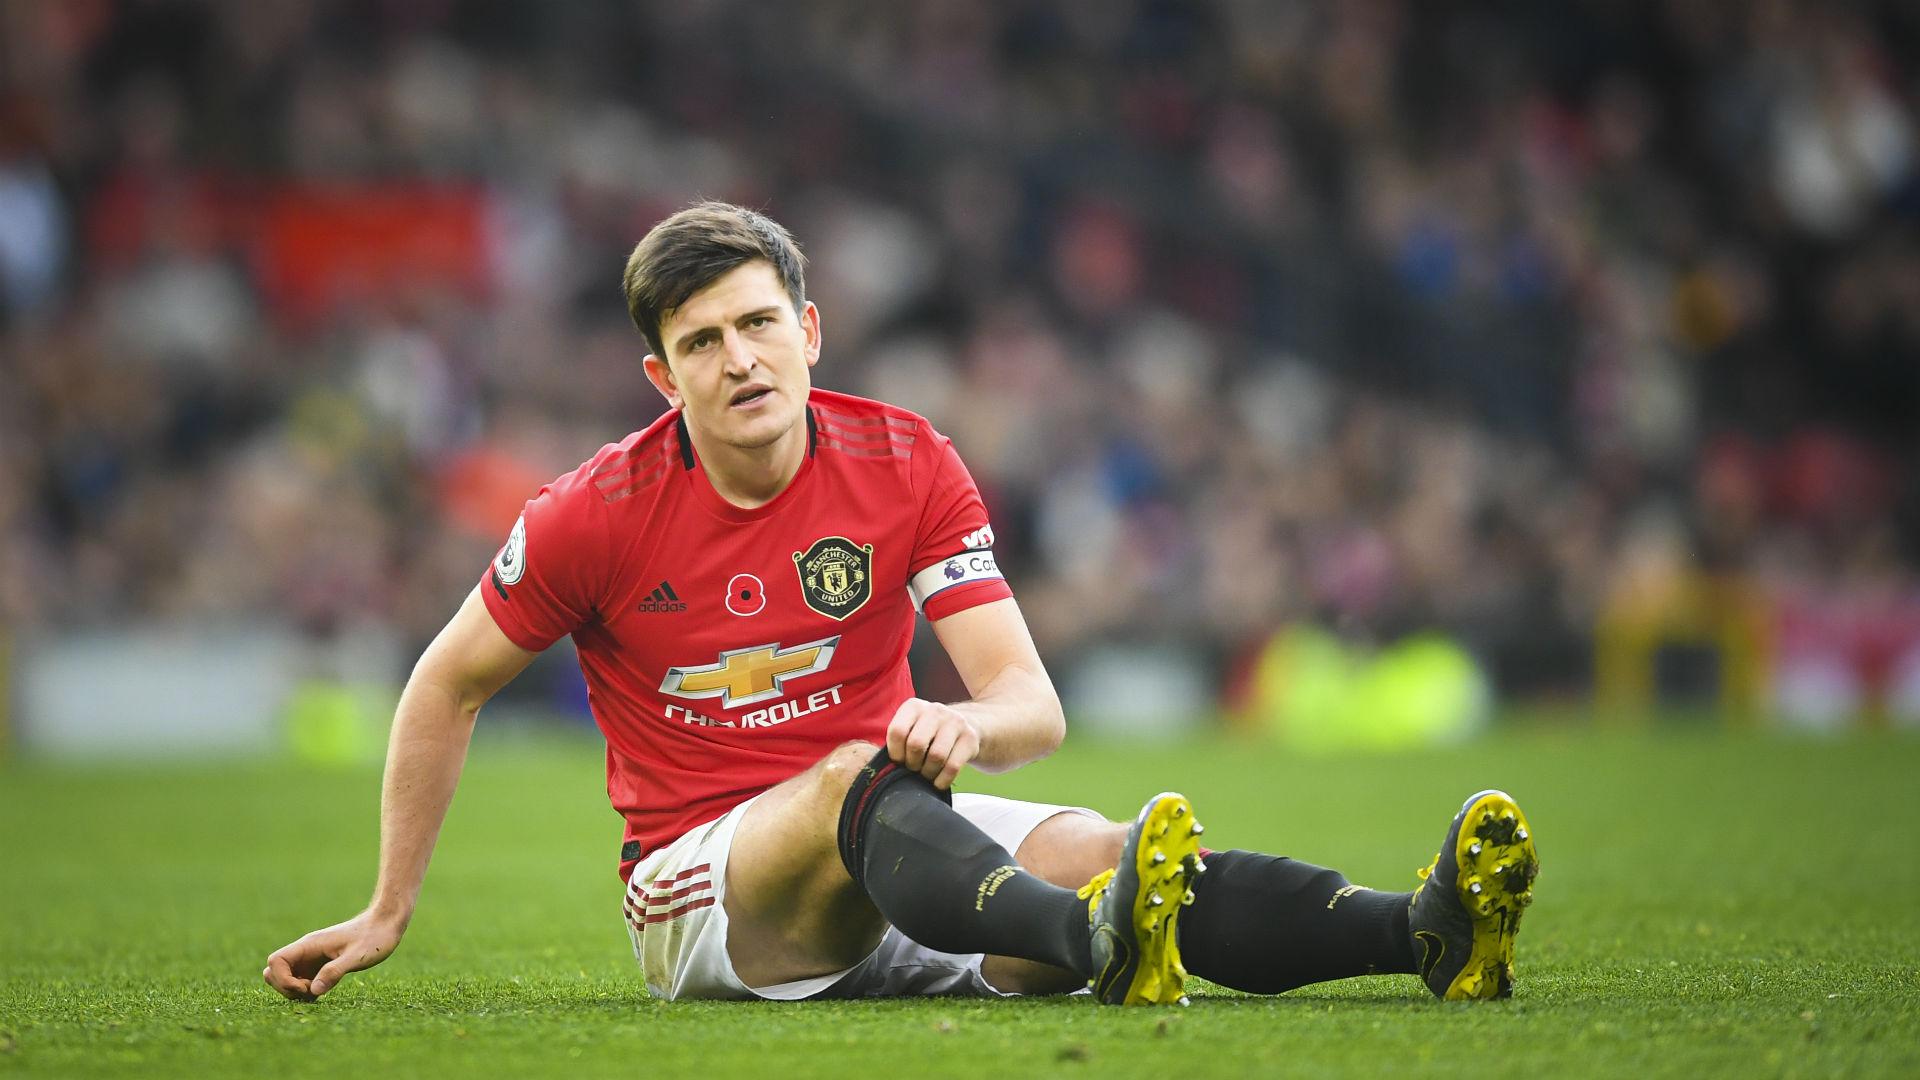 Solskjaer backs Maguire as long-term Man United captain